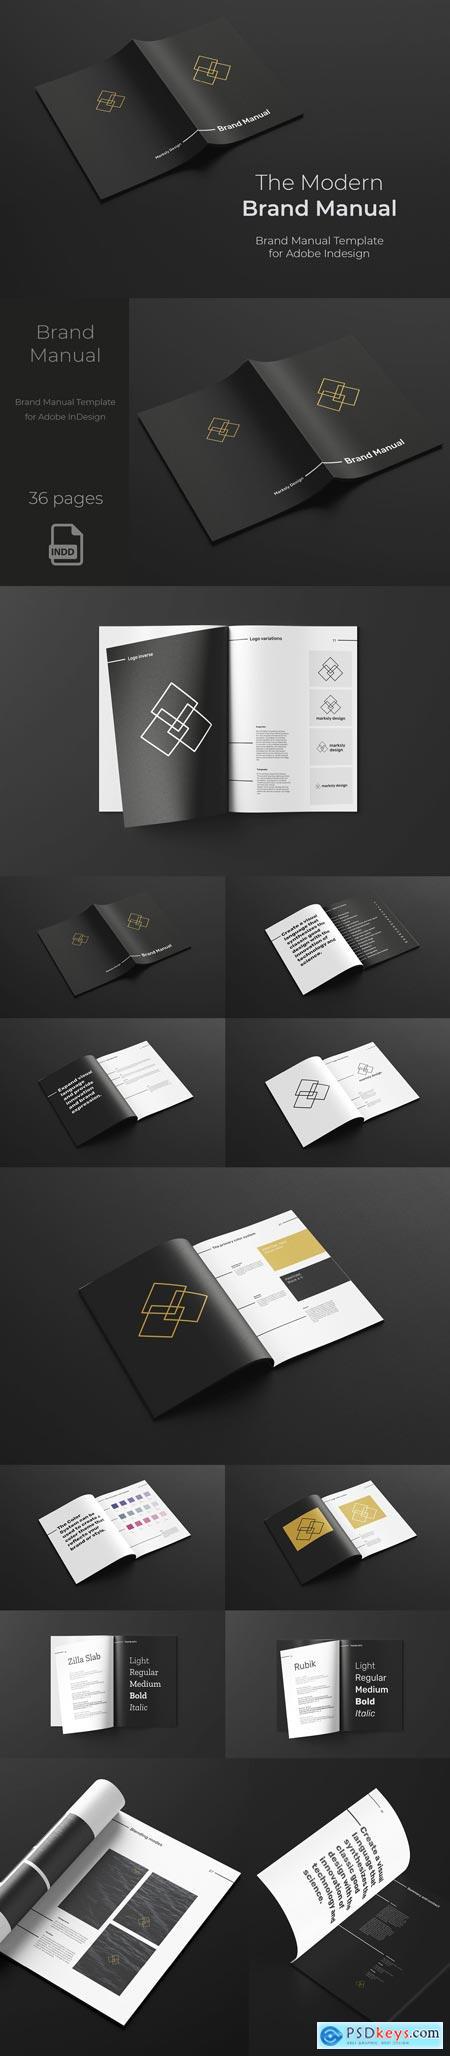 The Modern Brand Manual 3395040